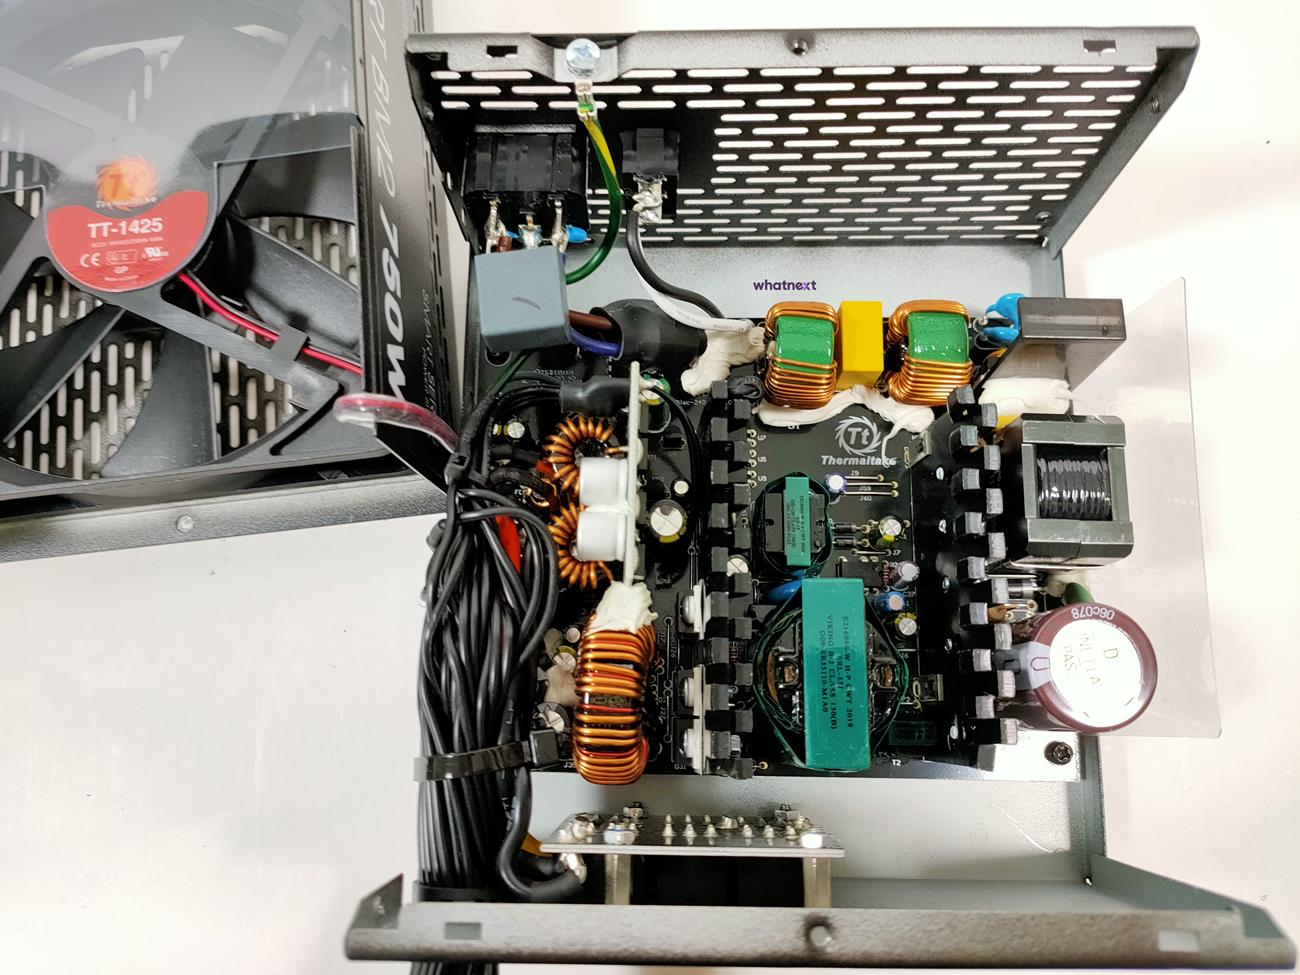 test Thermaltake Smart BM2 750W, recenzja Thermaltake Smart BM2 750W, opiniaThermaltake Smart BM2 750W